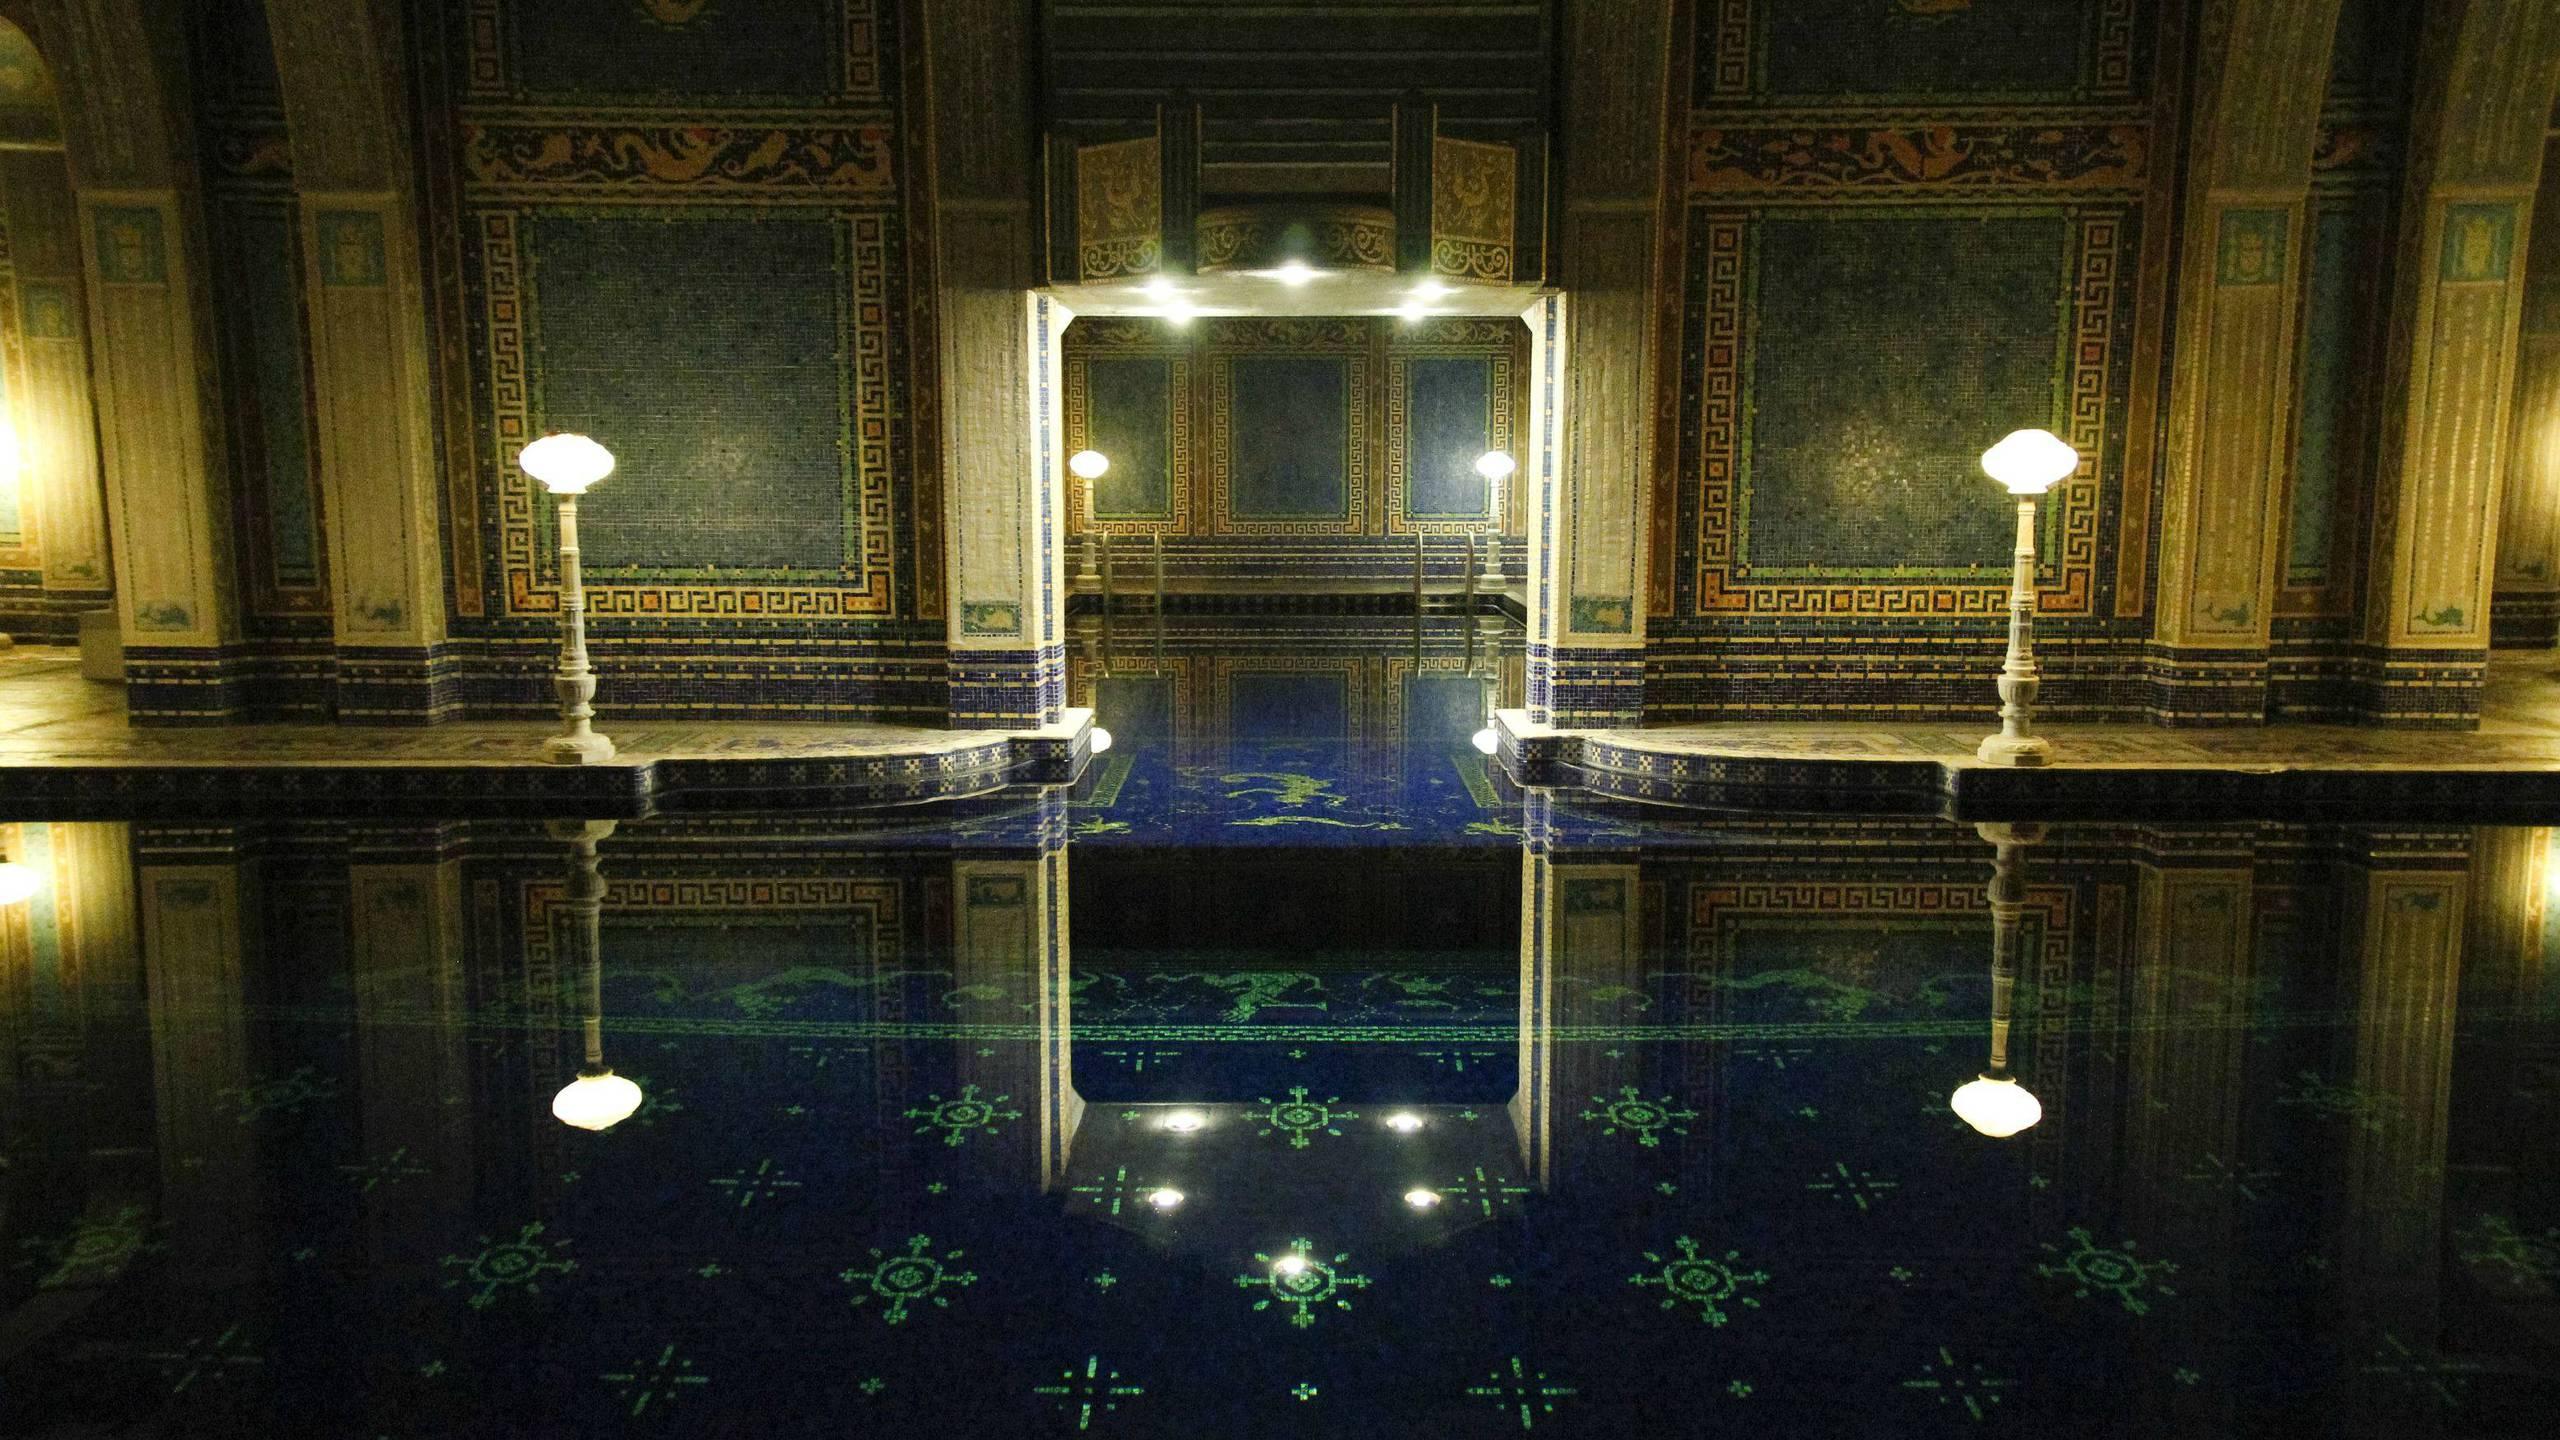 BOTPOST] The Hearst Castle Indoor Roman Pool at Night iimgurcom 2560x1440